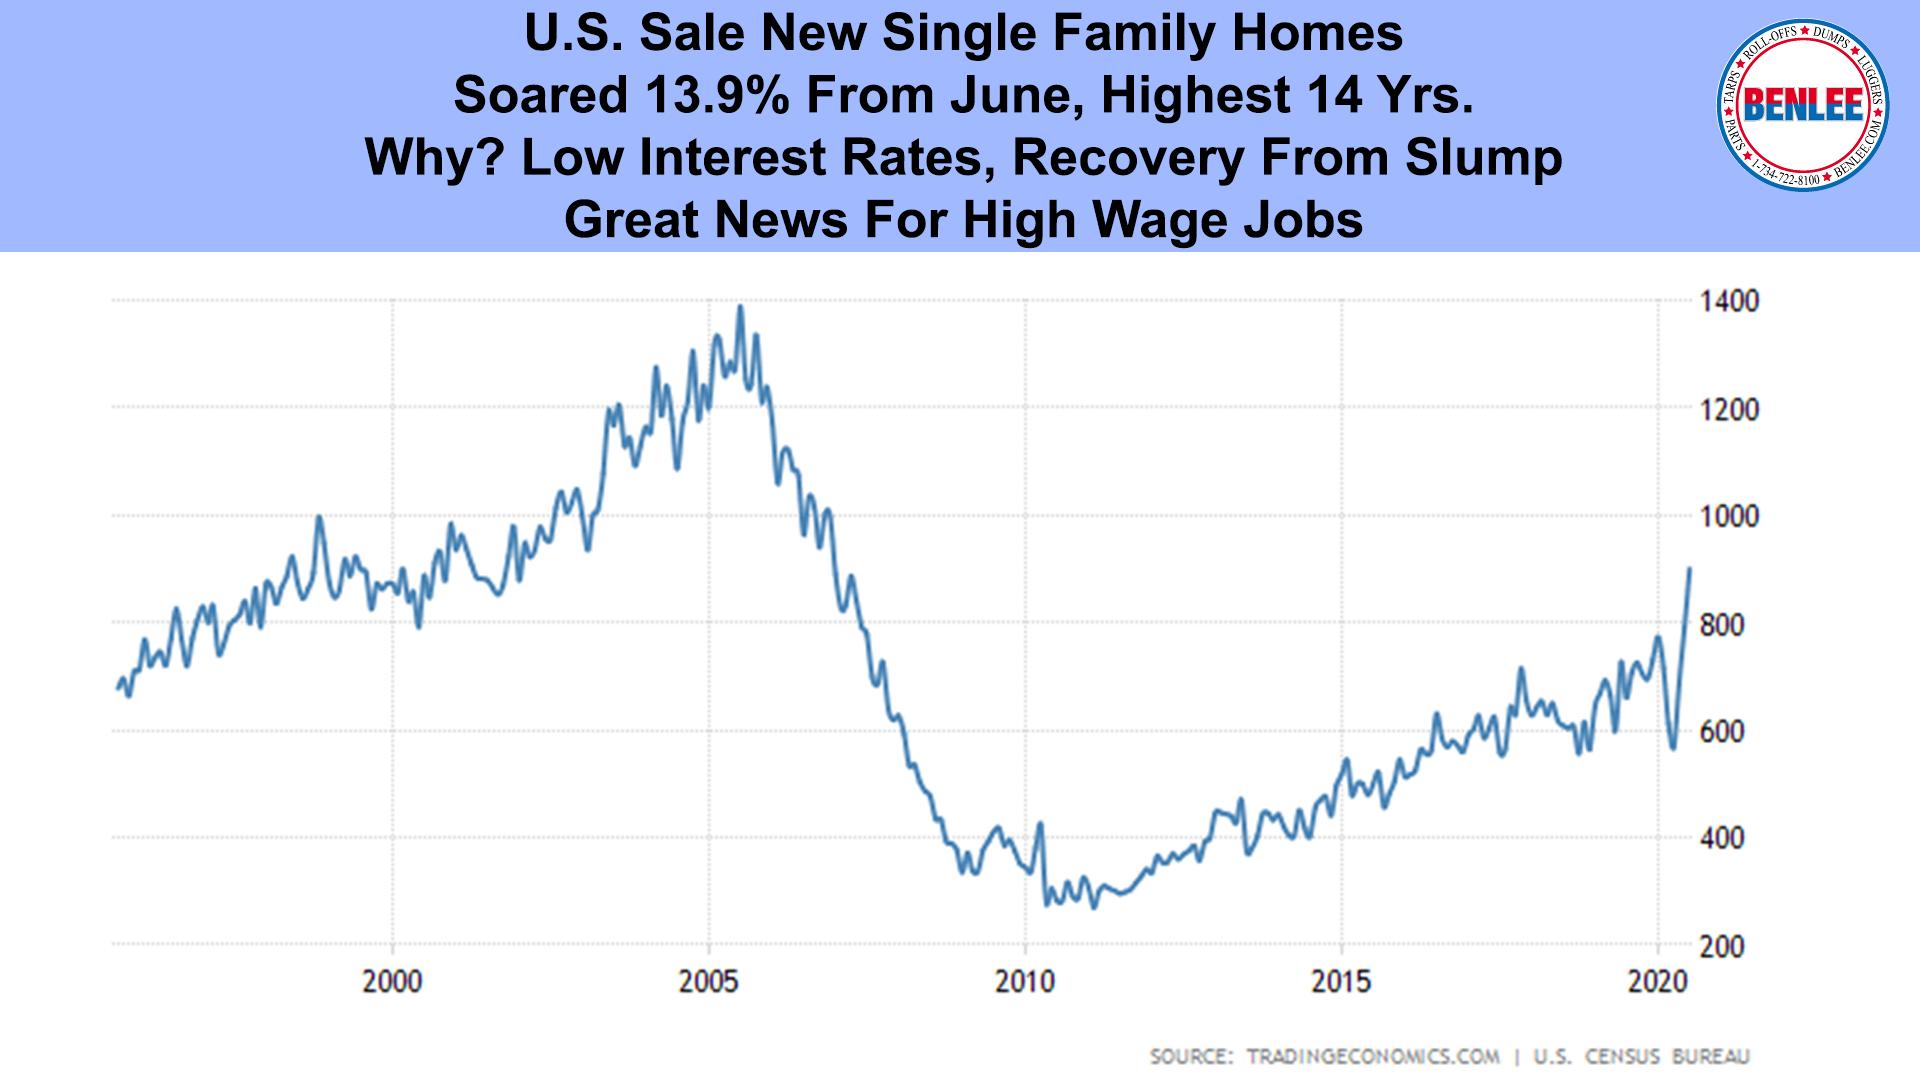 U.S. Sale New Single Family Homes